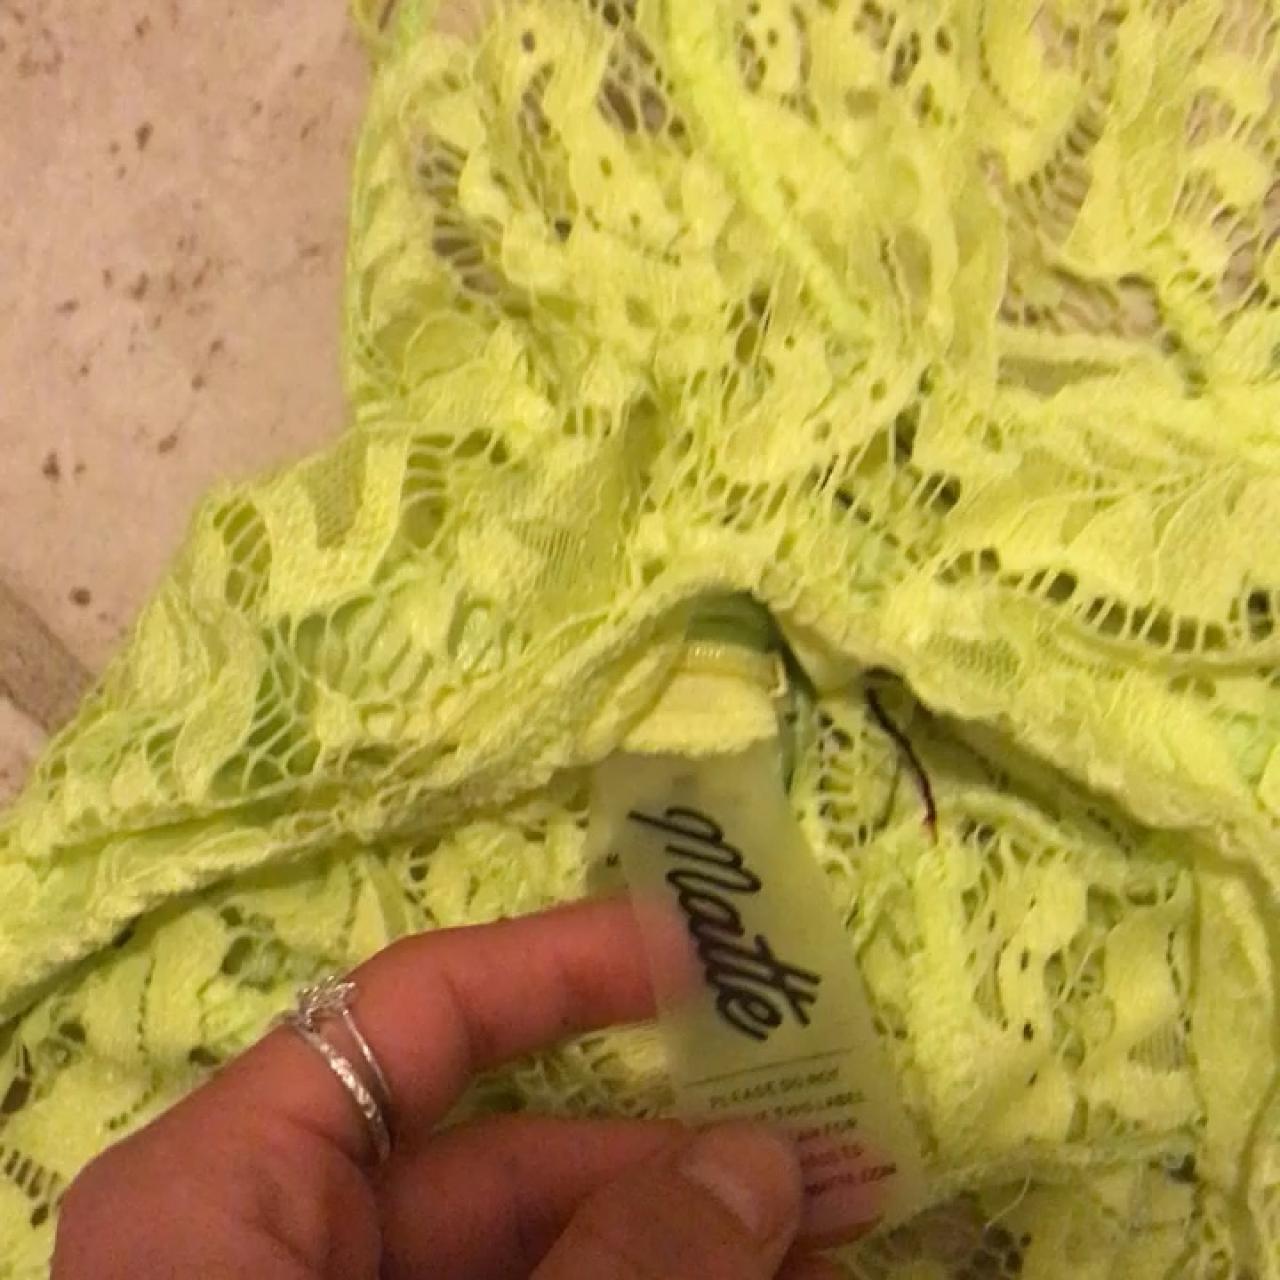 e37baa7f4b5f Matte brand siren lace bodysuit. Size XS. Never worn